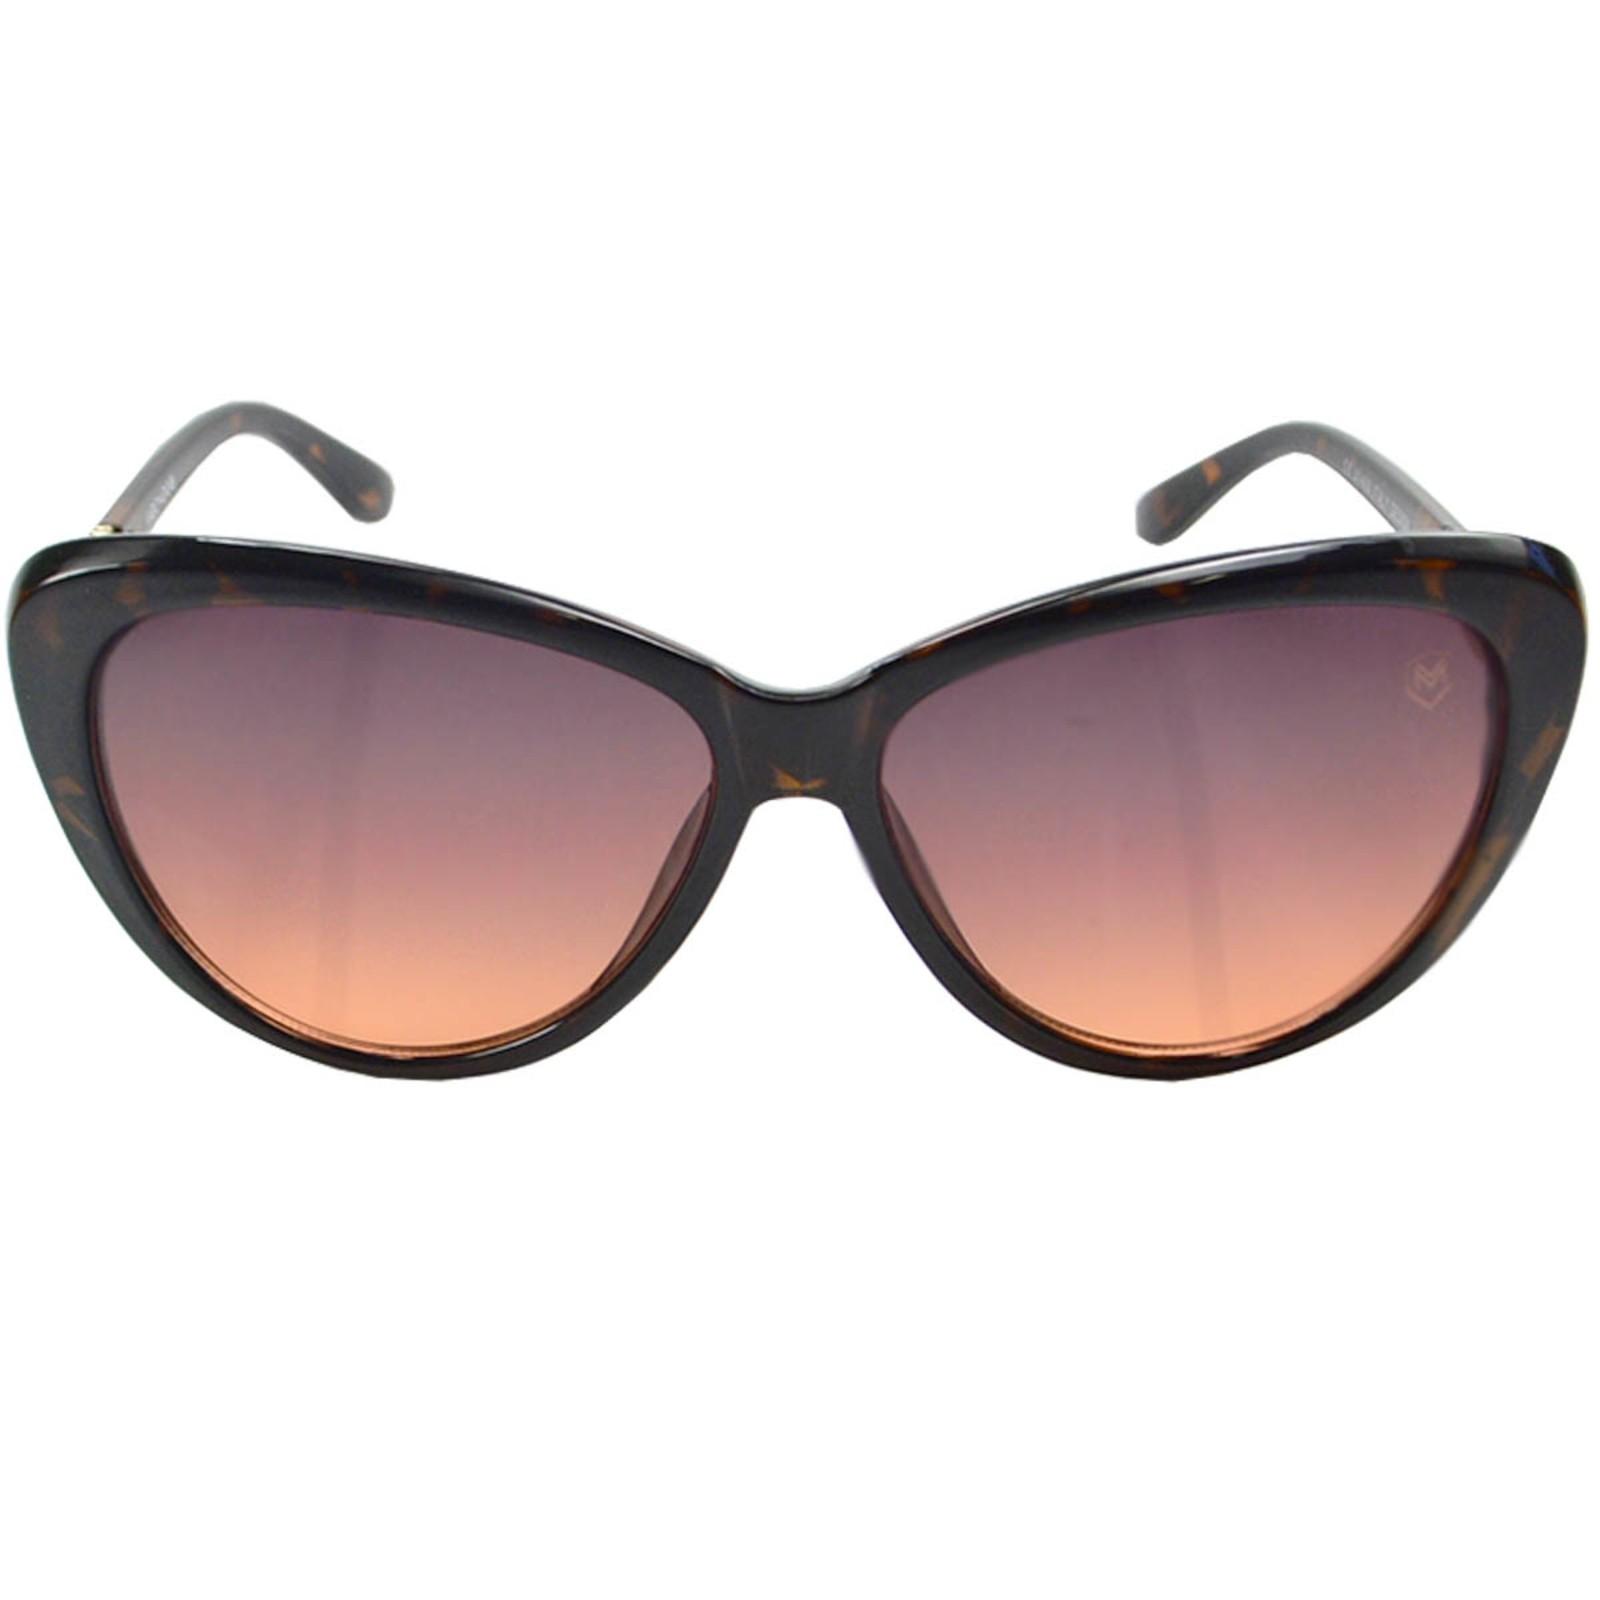 Óculos De Sol Mackage Feminino Acetato Gateado - Tartaruga